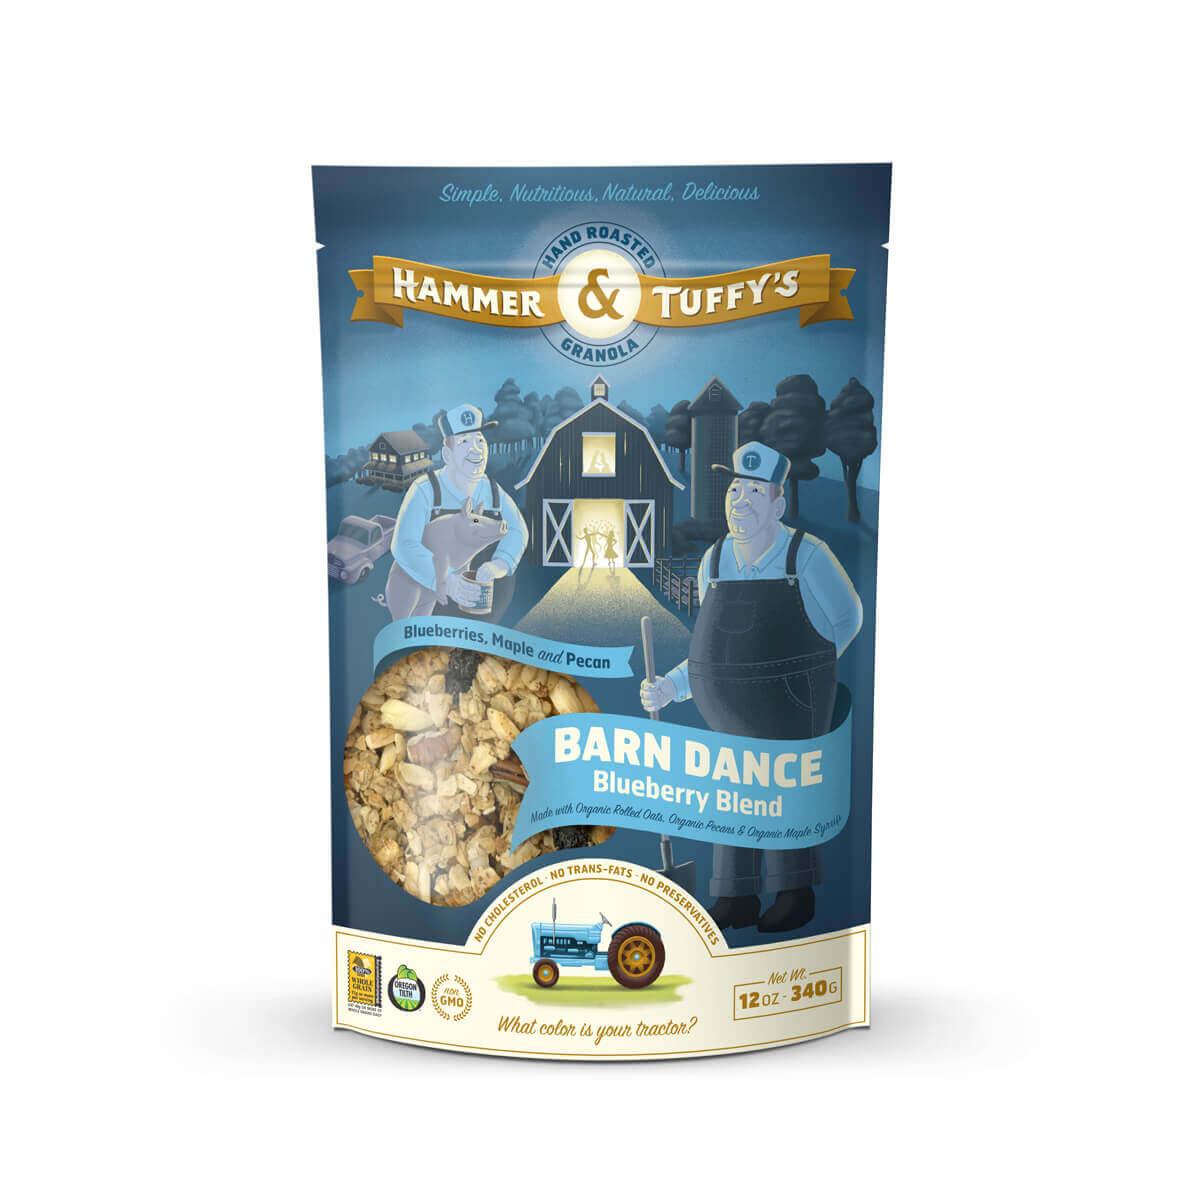 Granola Packaging Hero Image